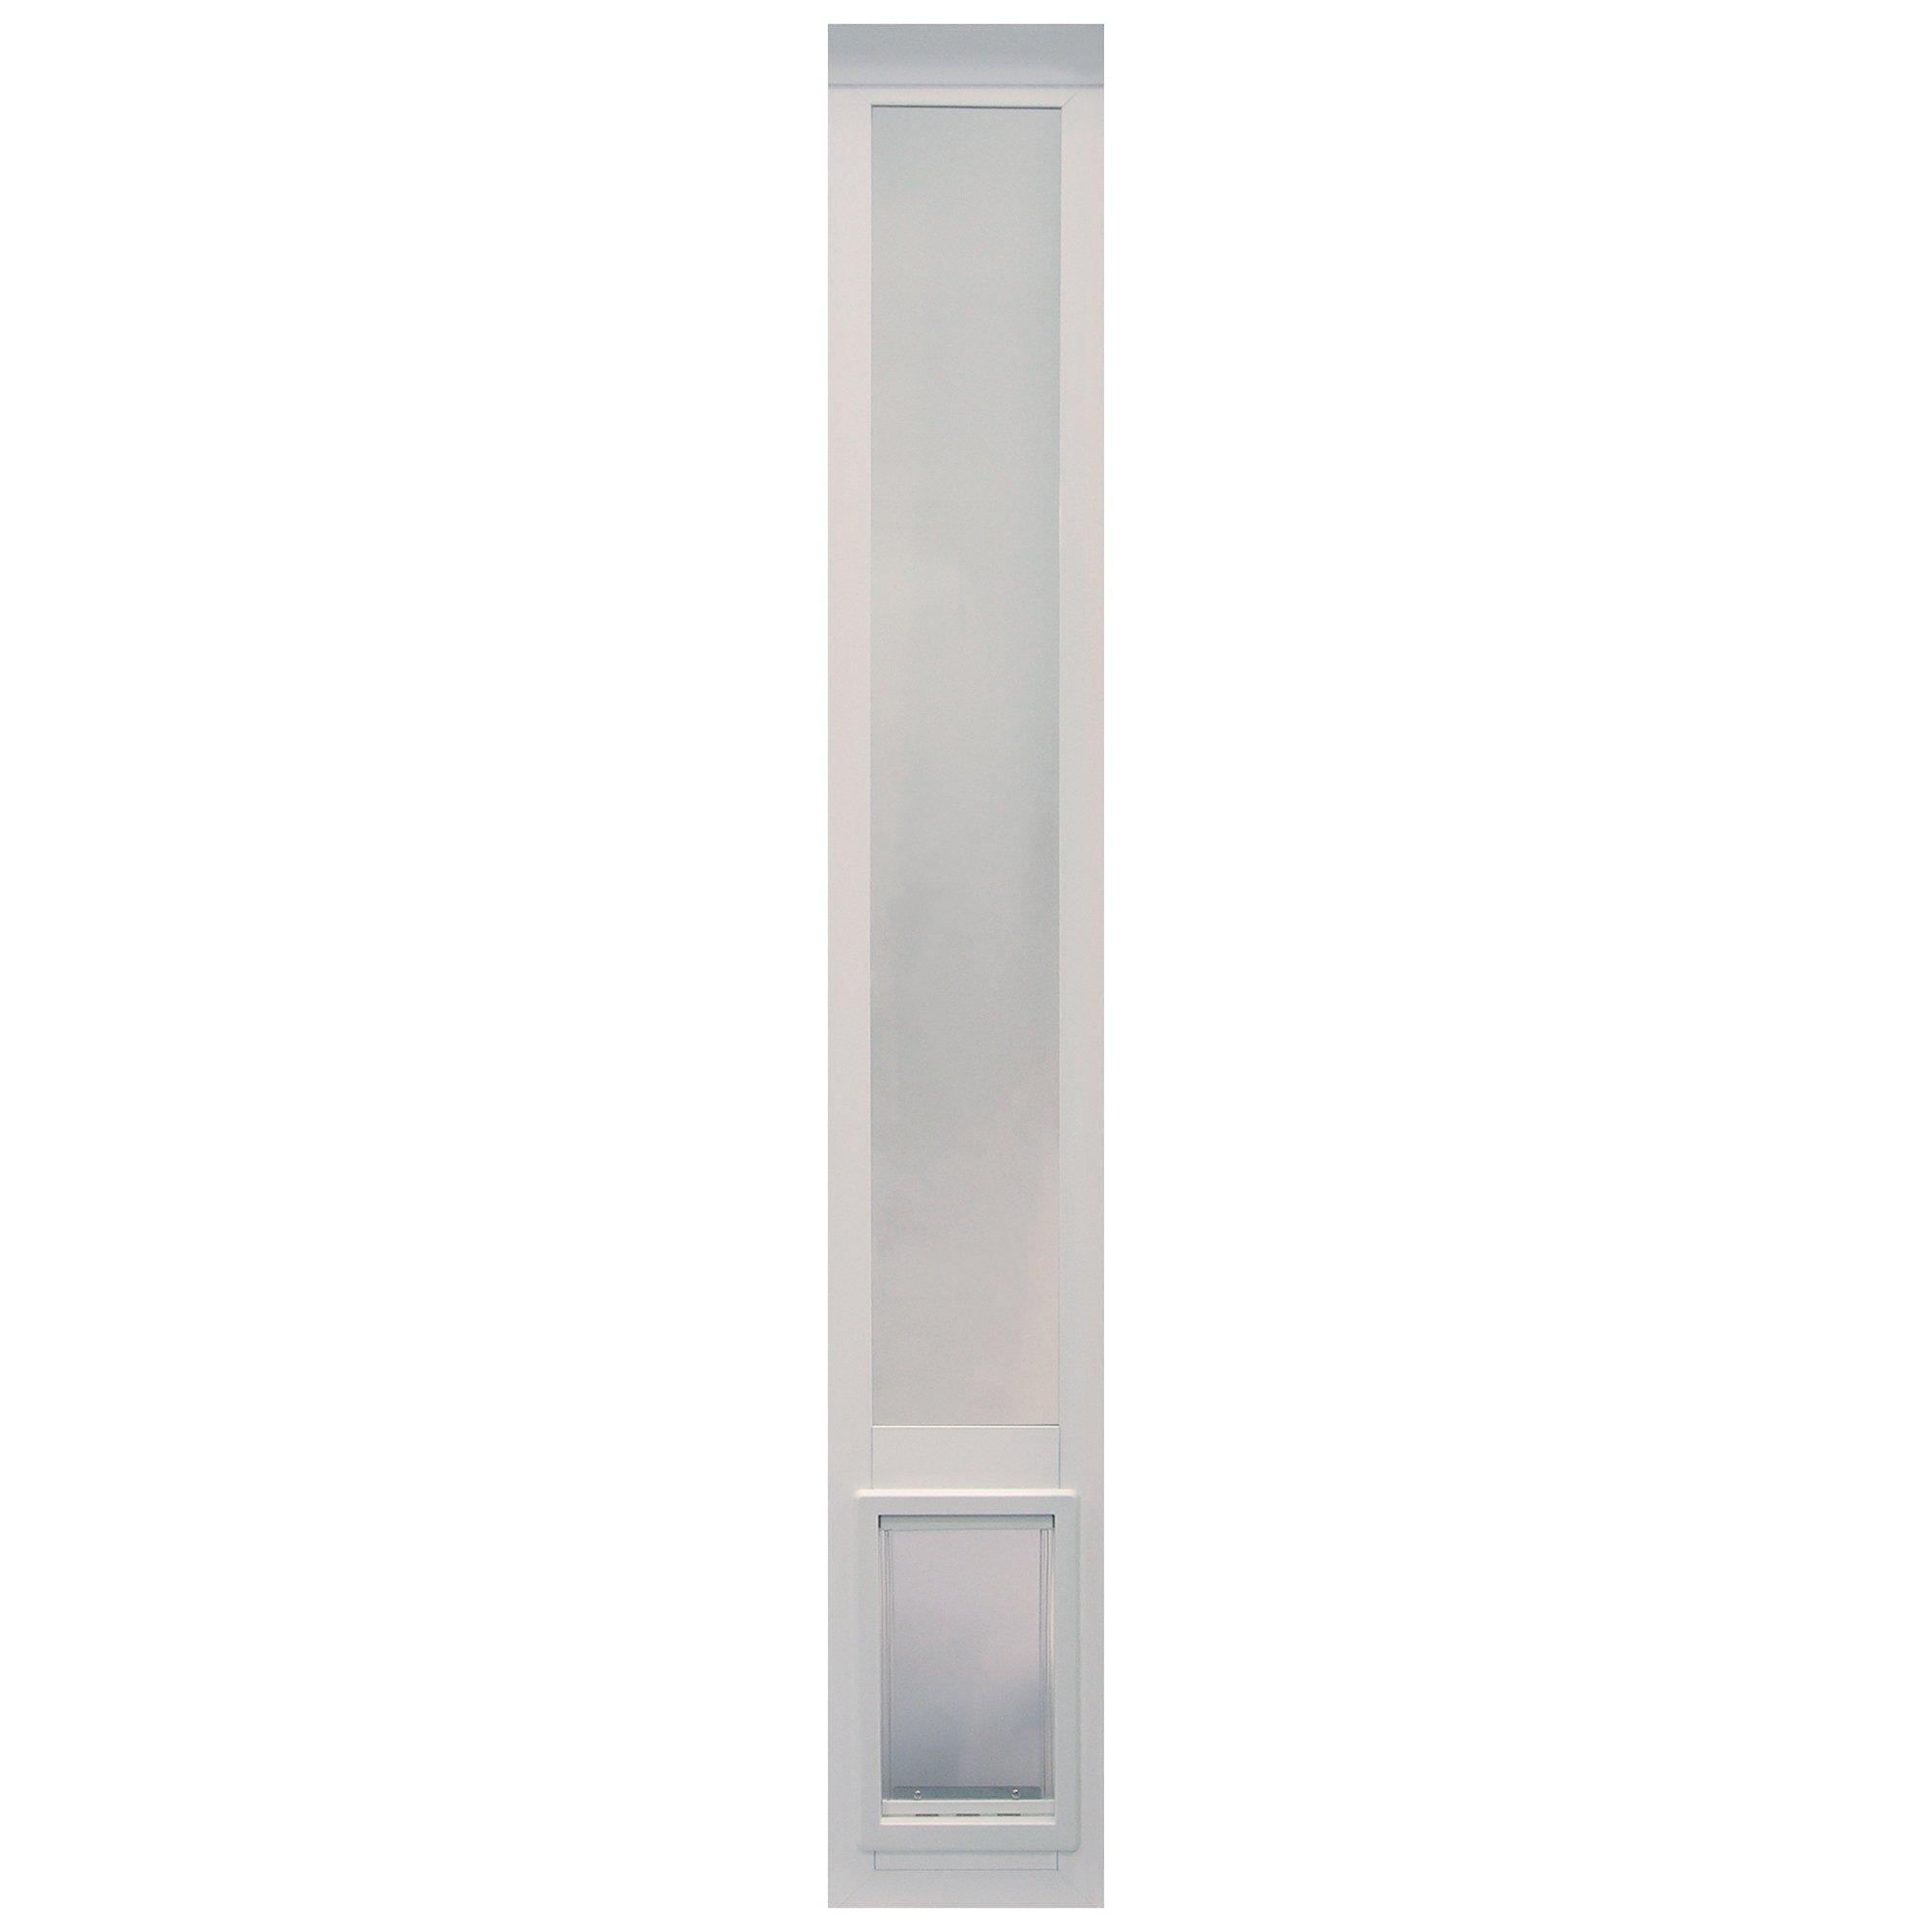 "Ideal Pet Products Non Insulated Vinyl Pet Patio Door, White, Medium, 6 5/8"" x 11 1/4"" Flap Size"